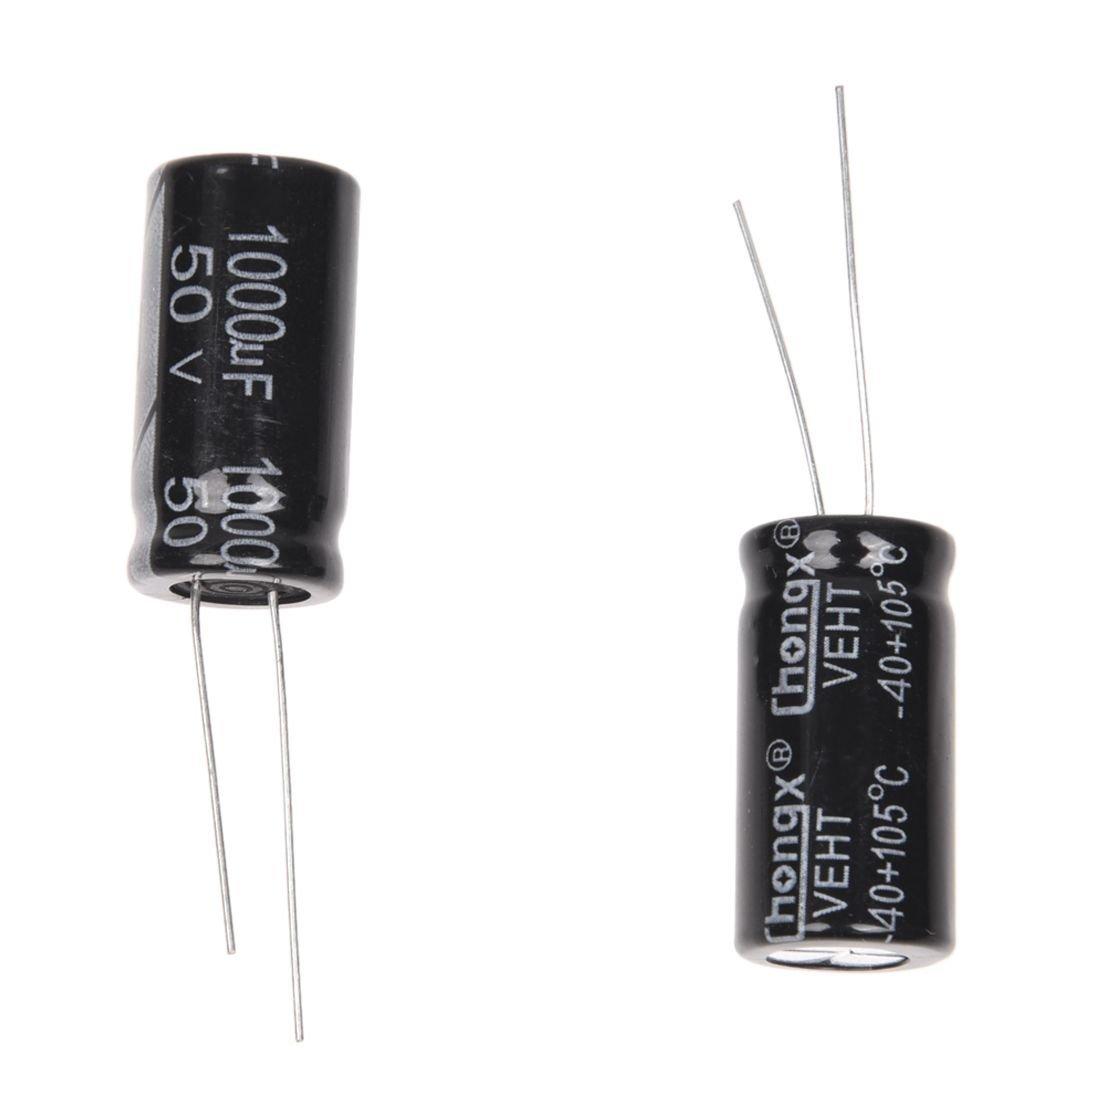 20 Pz 1000uF 50V 105C condensatori elettrolitici in alluminio 13x25mm R TOOGOO